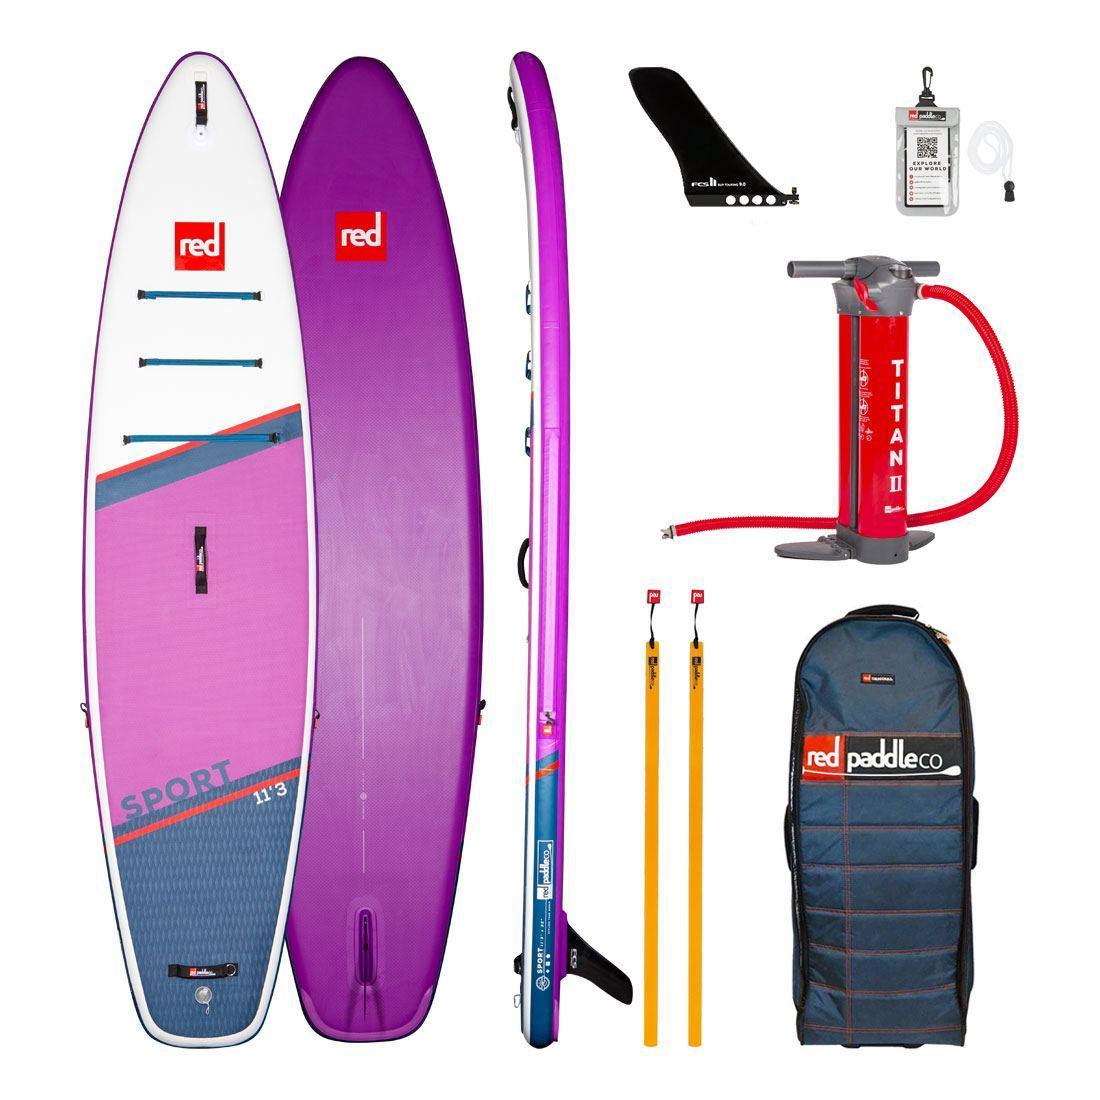 "Сапборд Red Paddle Co Sport SE 11'3"" x 32"" 2021 - надувная доска для САП серфинга, sup board"